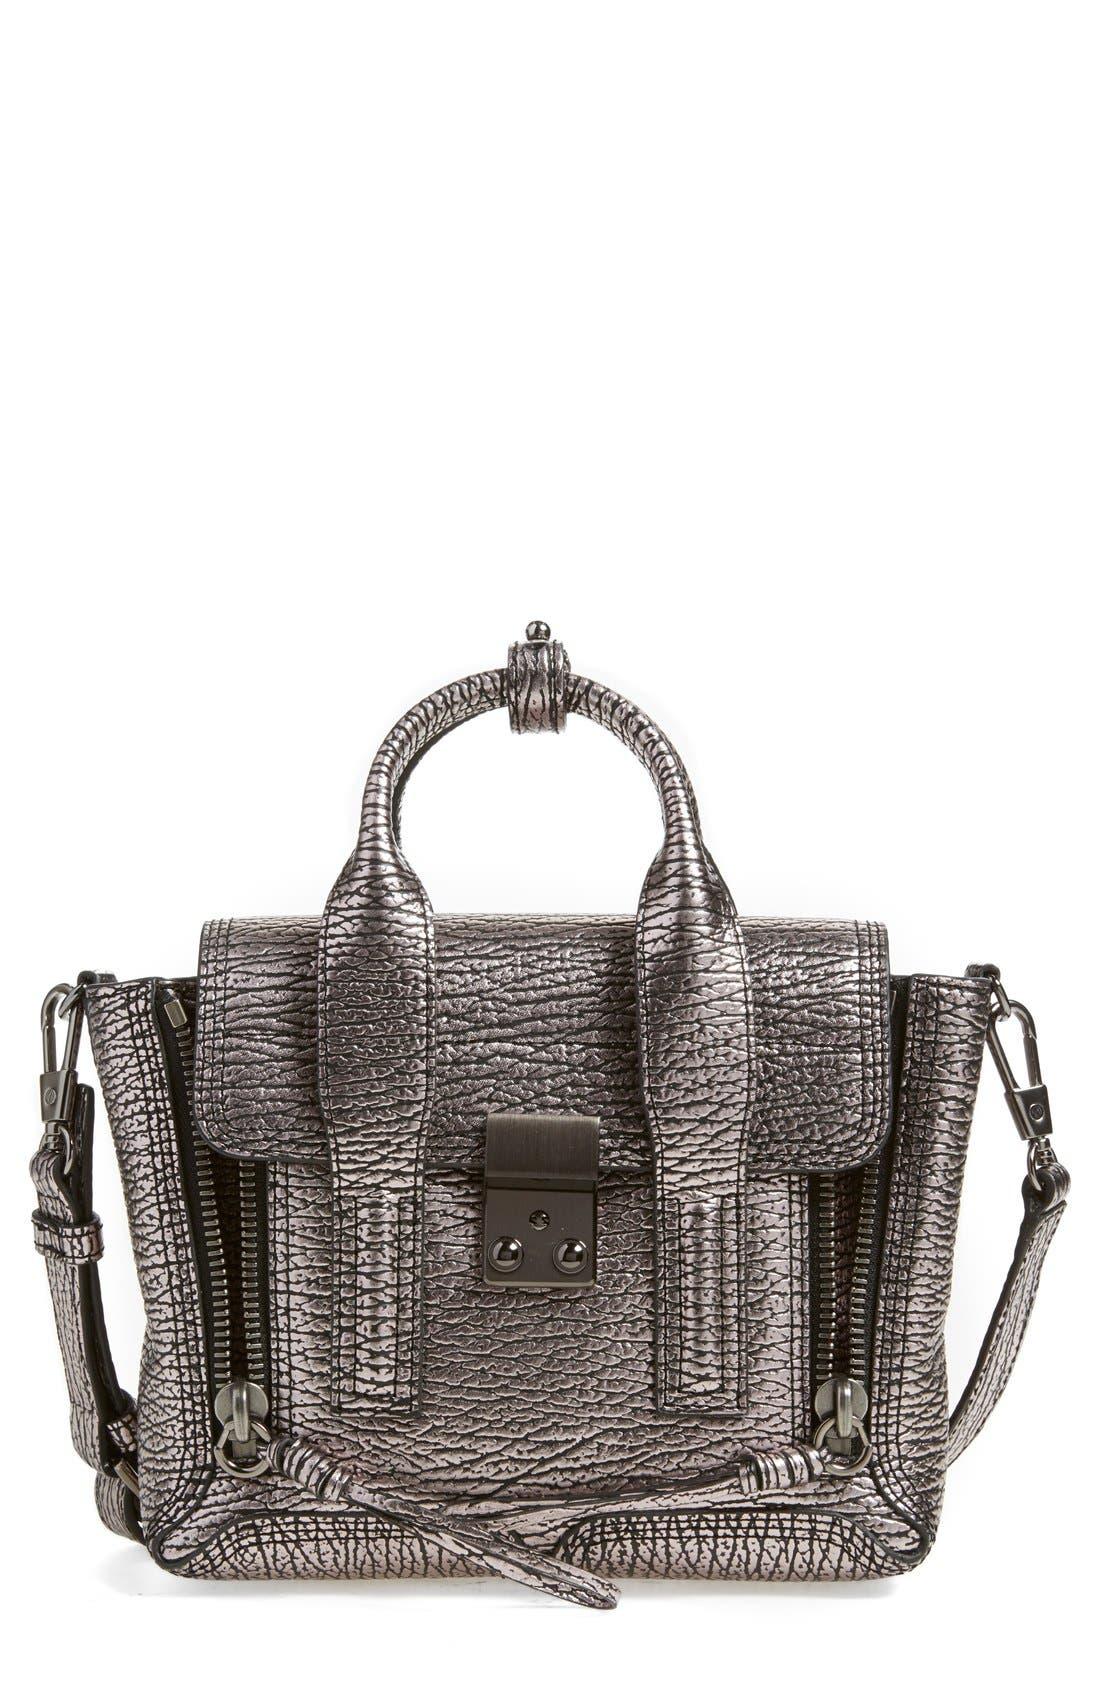 Main Image - 3.1 Phillip Lim 'Mini Pashli' Metallic Leather Satchel